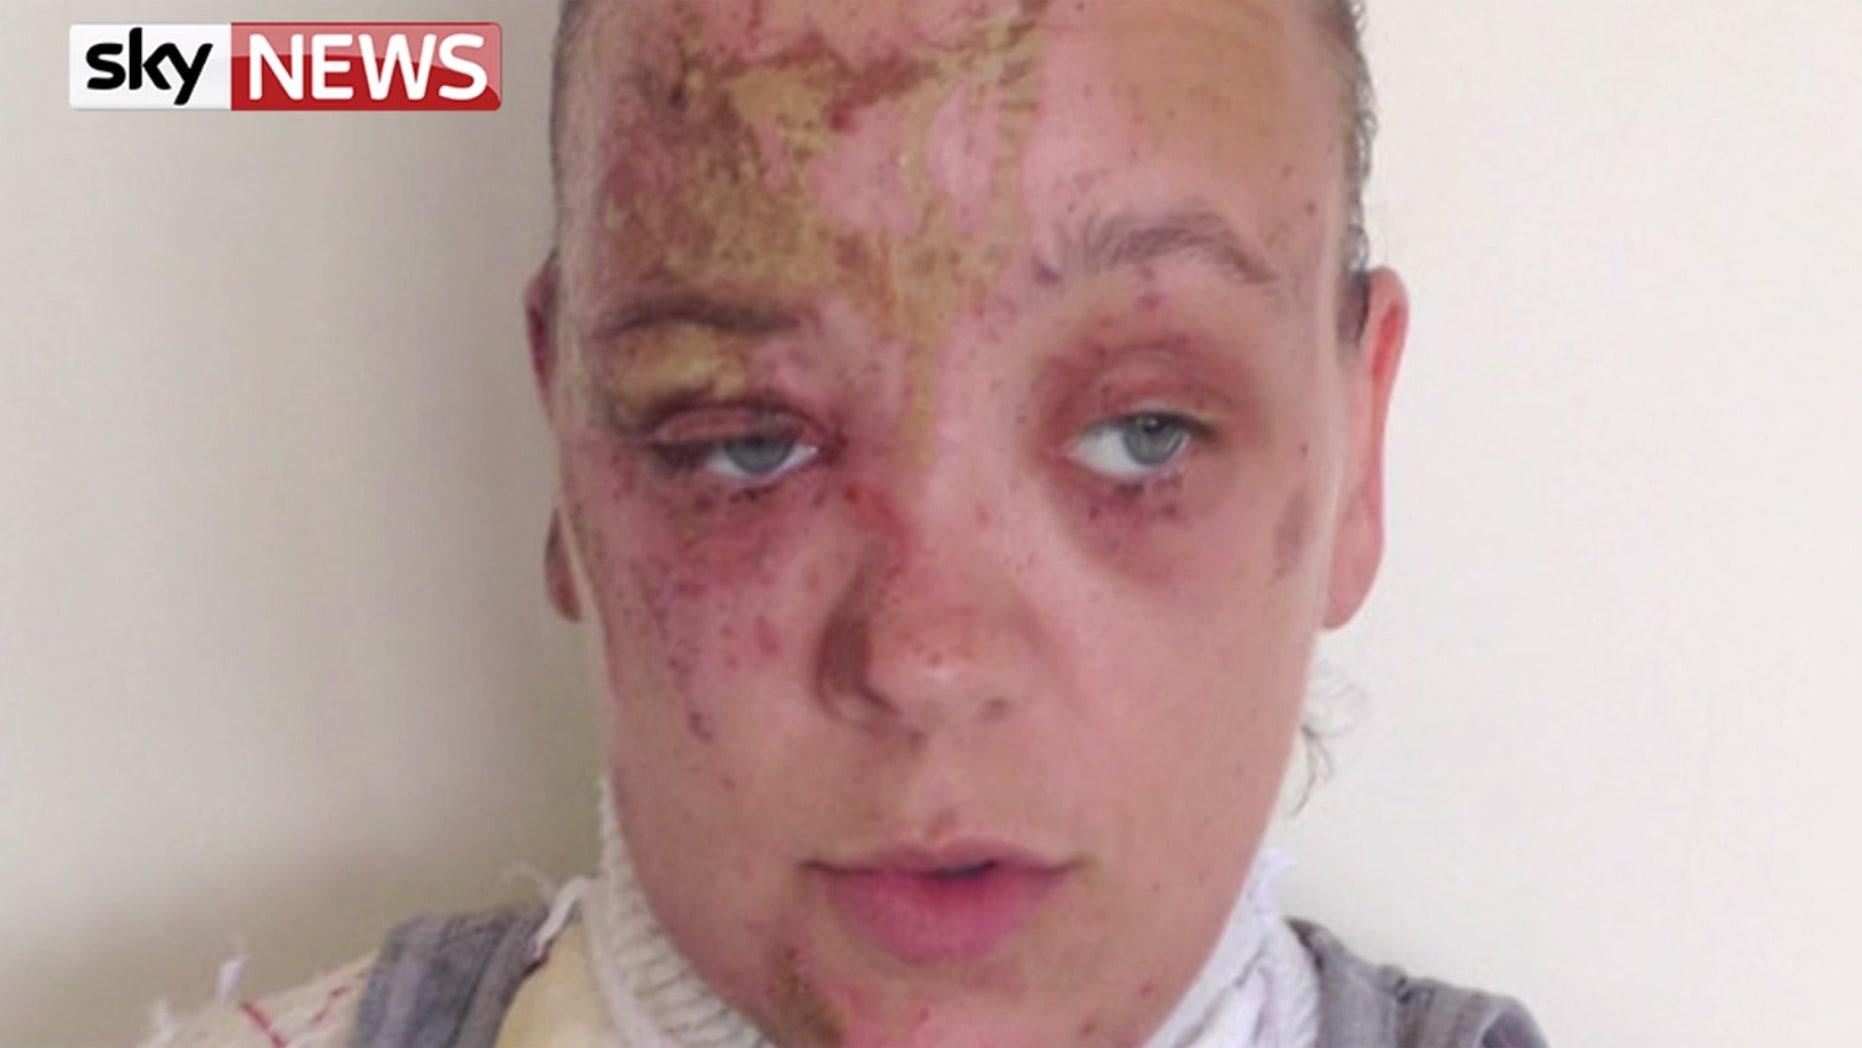 Tara Quigley said she still has nightmares of the acid attack.